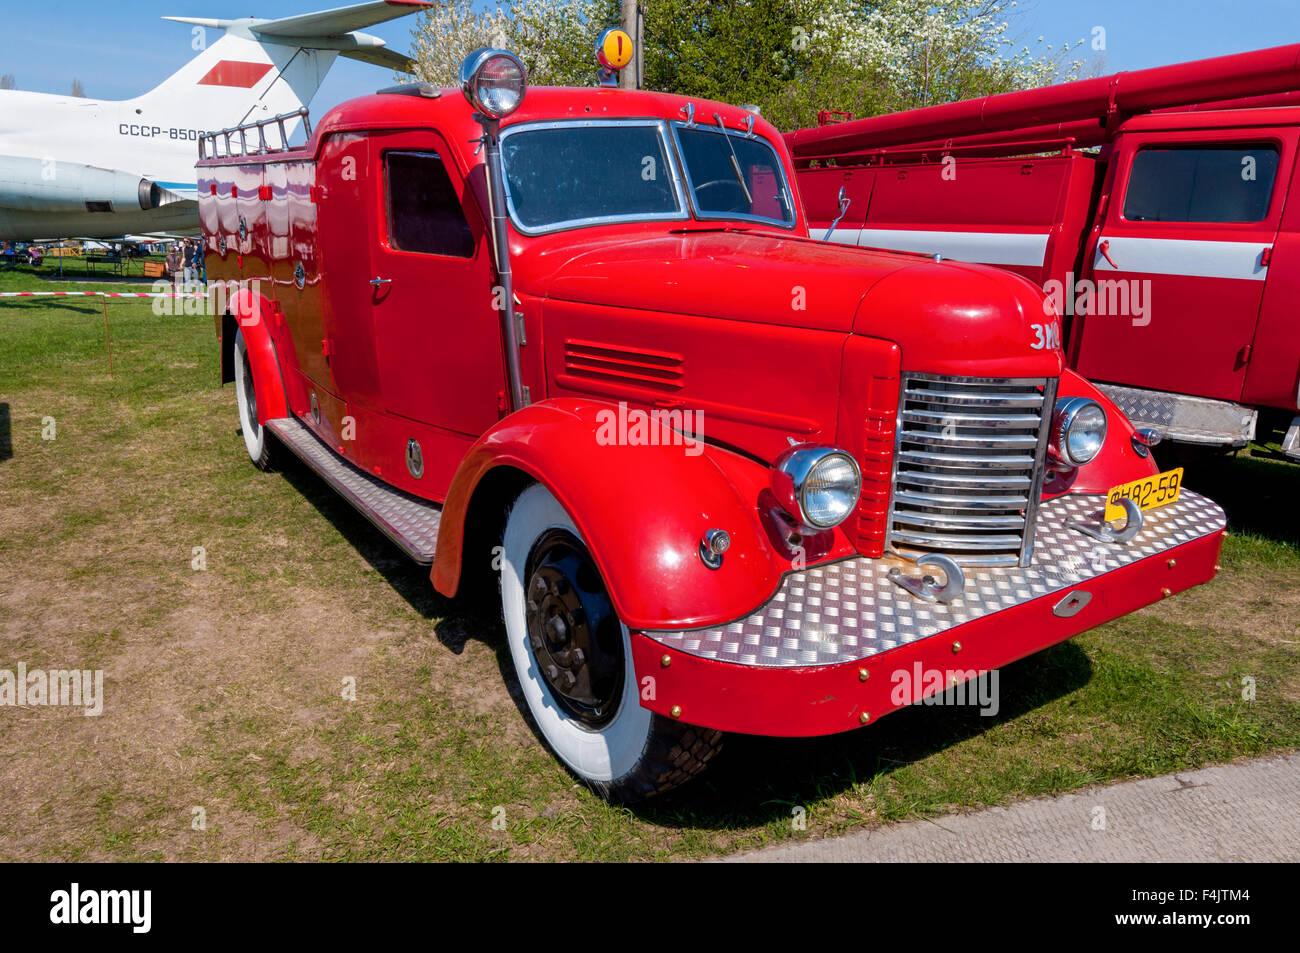 "The festival ""Old Car Fest 2015"", showed an fire truck ZIS-150 vintage model Stock Photo"